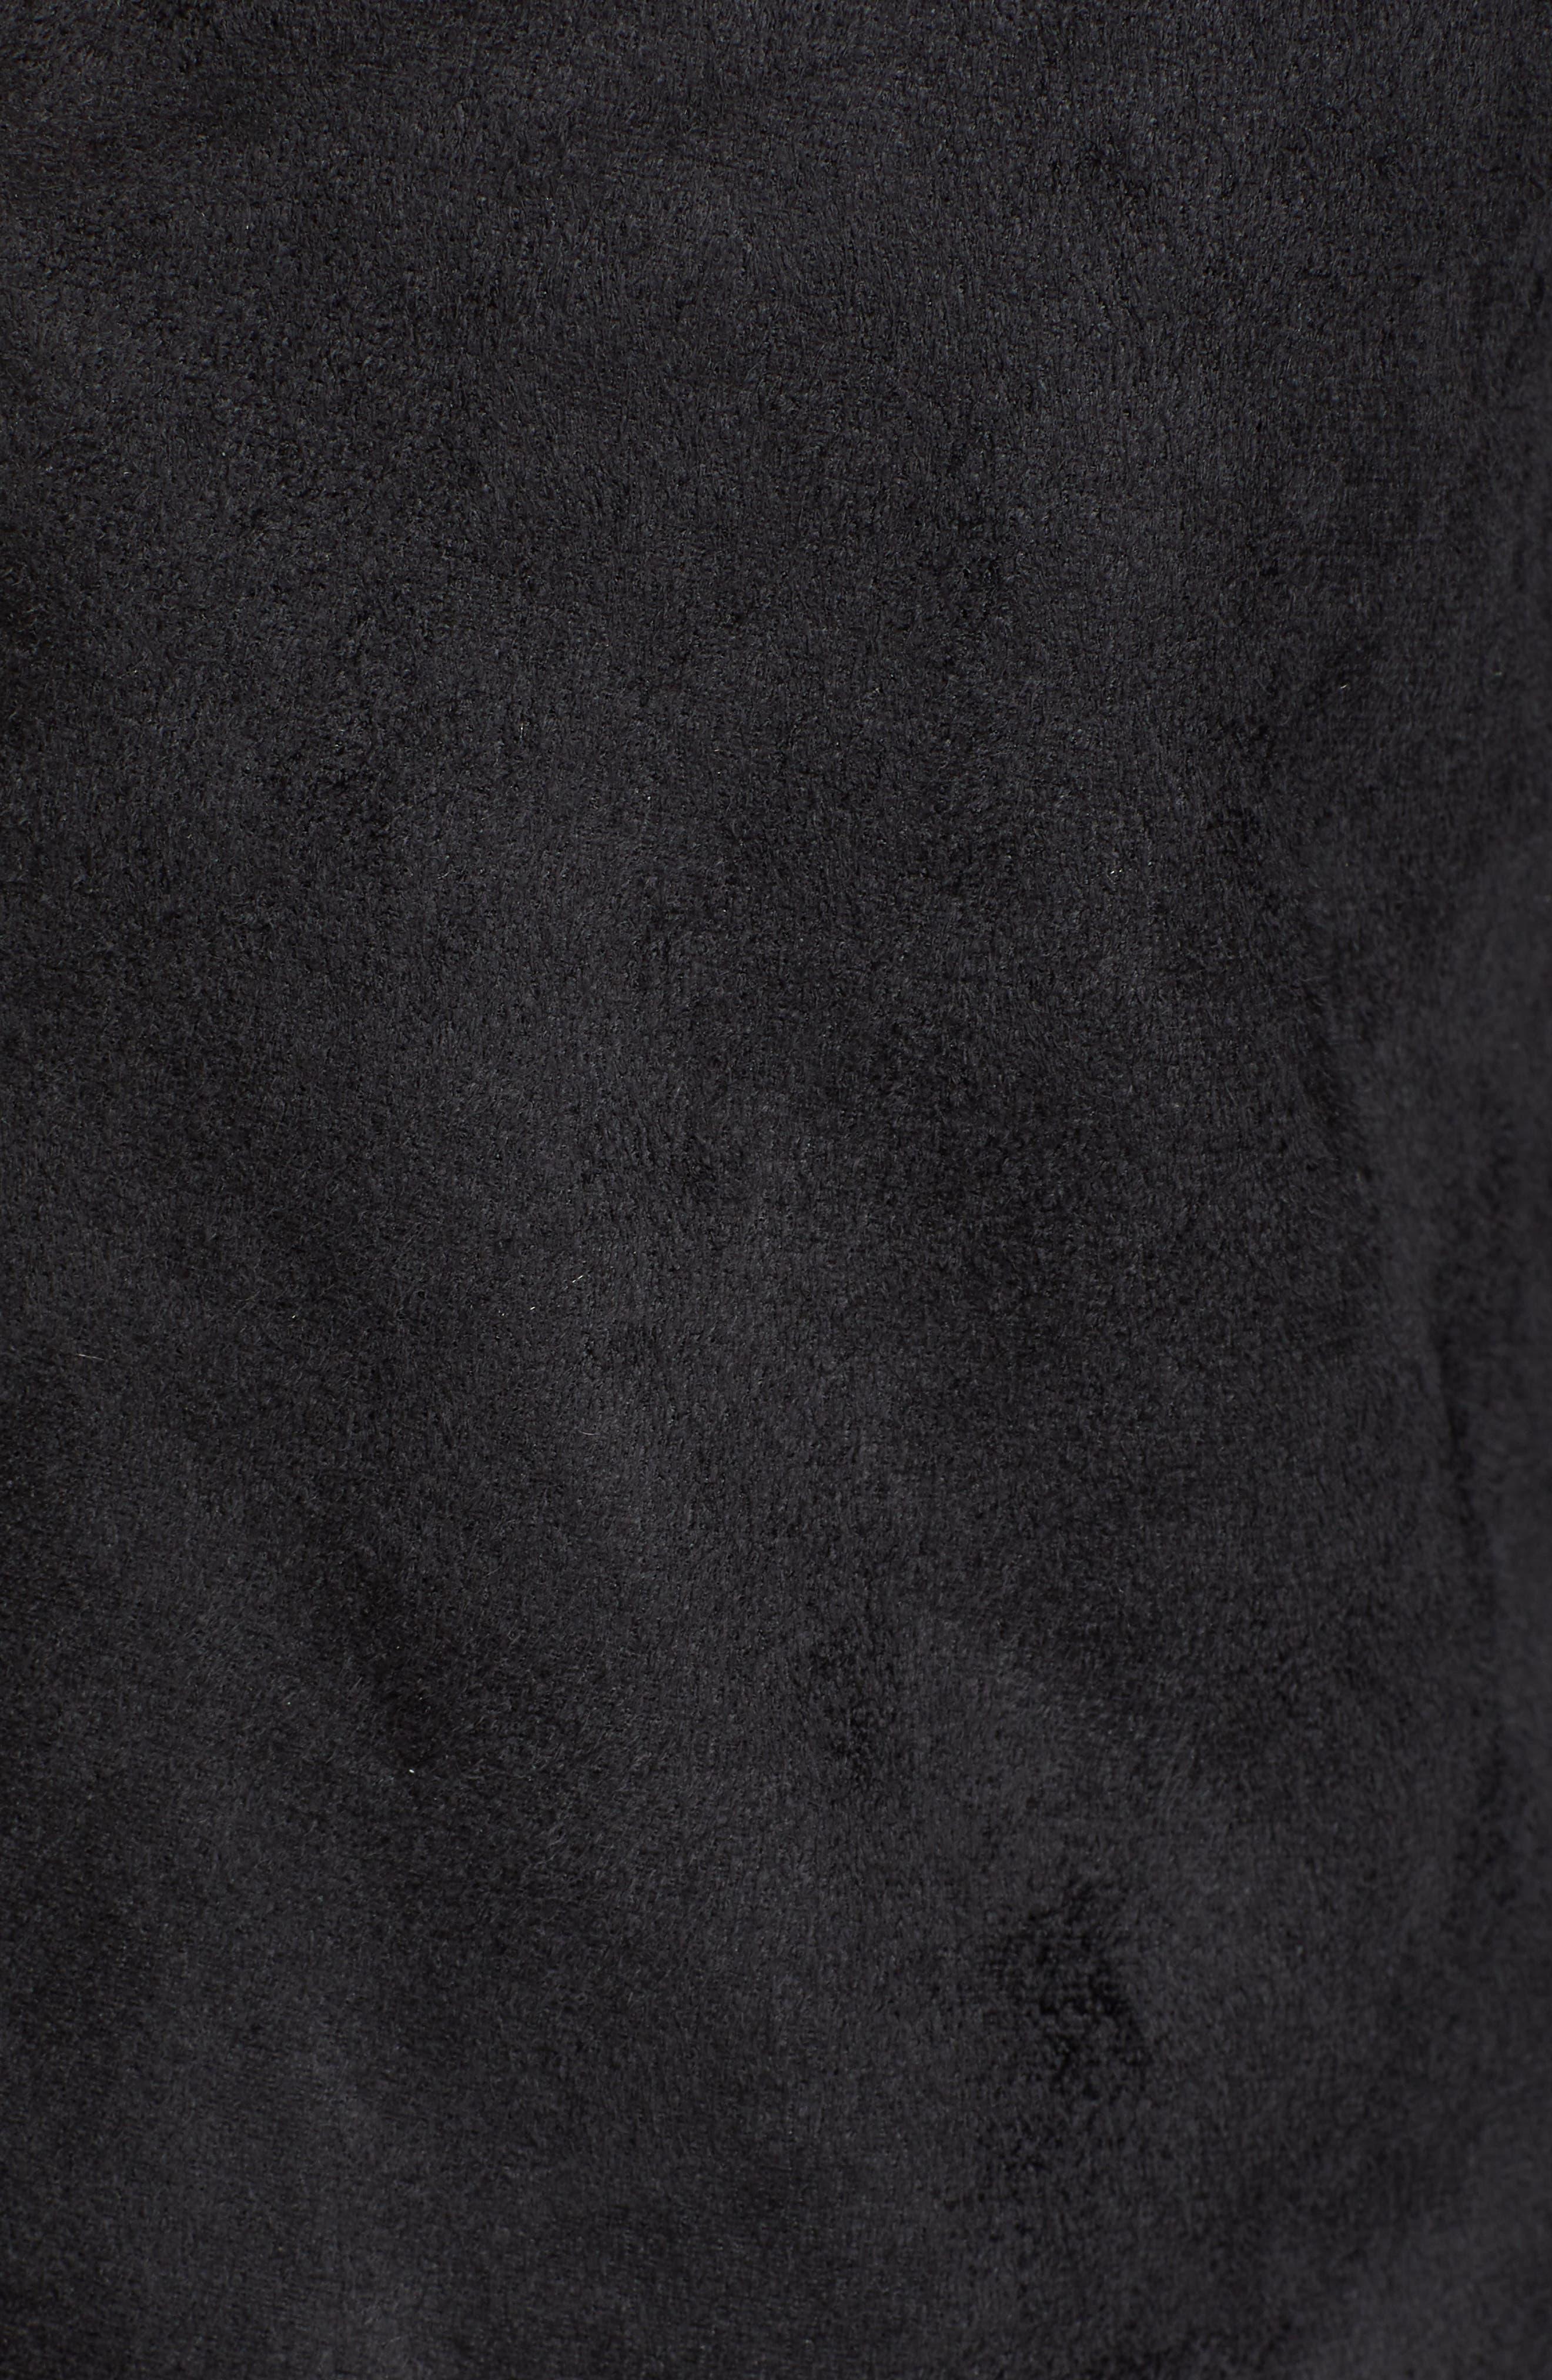 Faux Shearling Jacket,                             Alternate thumbnail 7, color,                             001